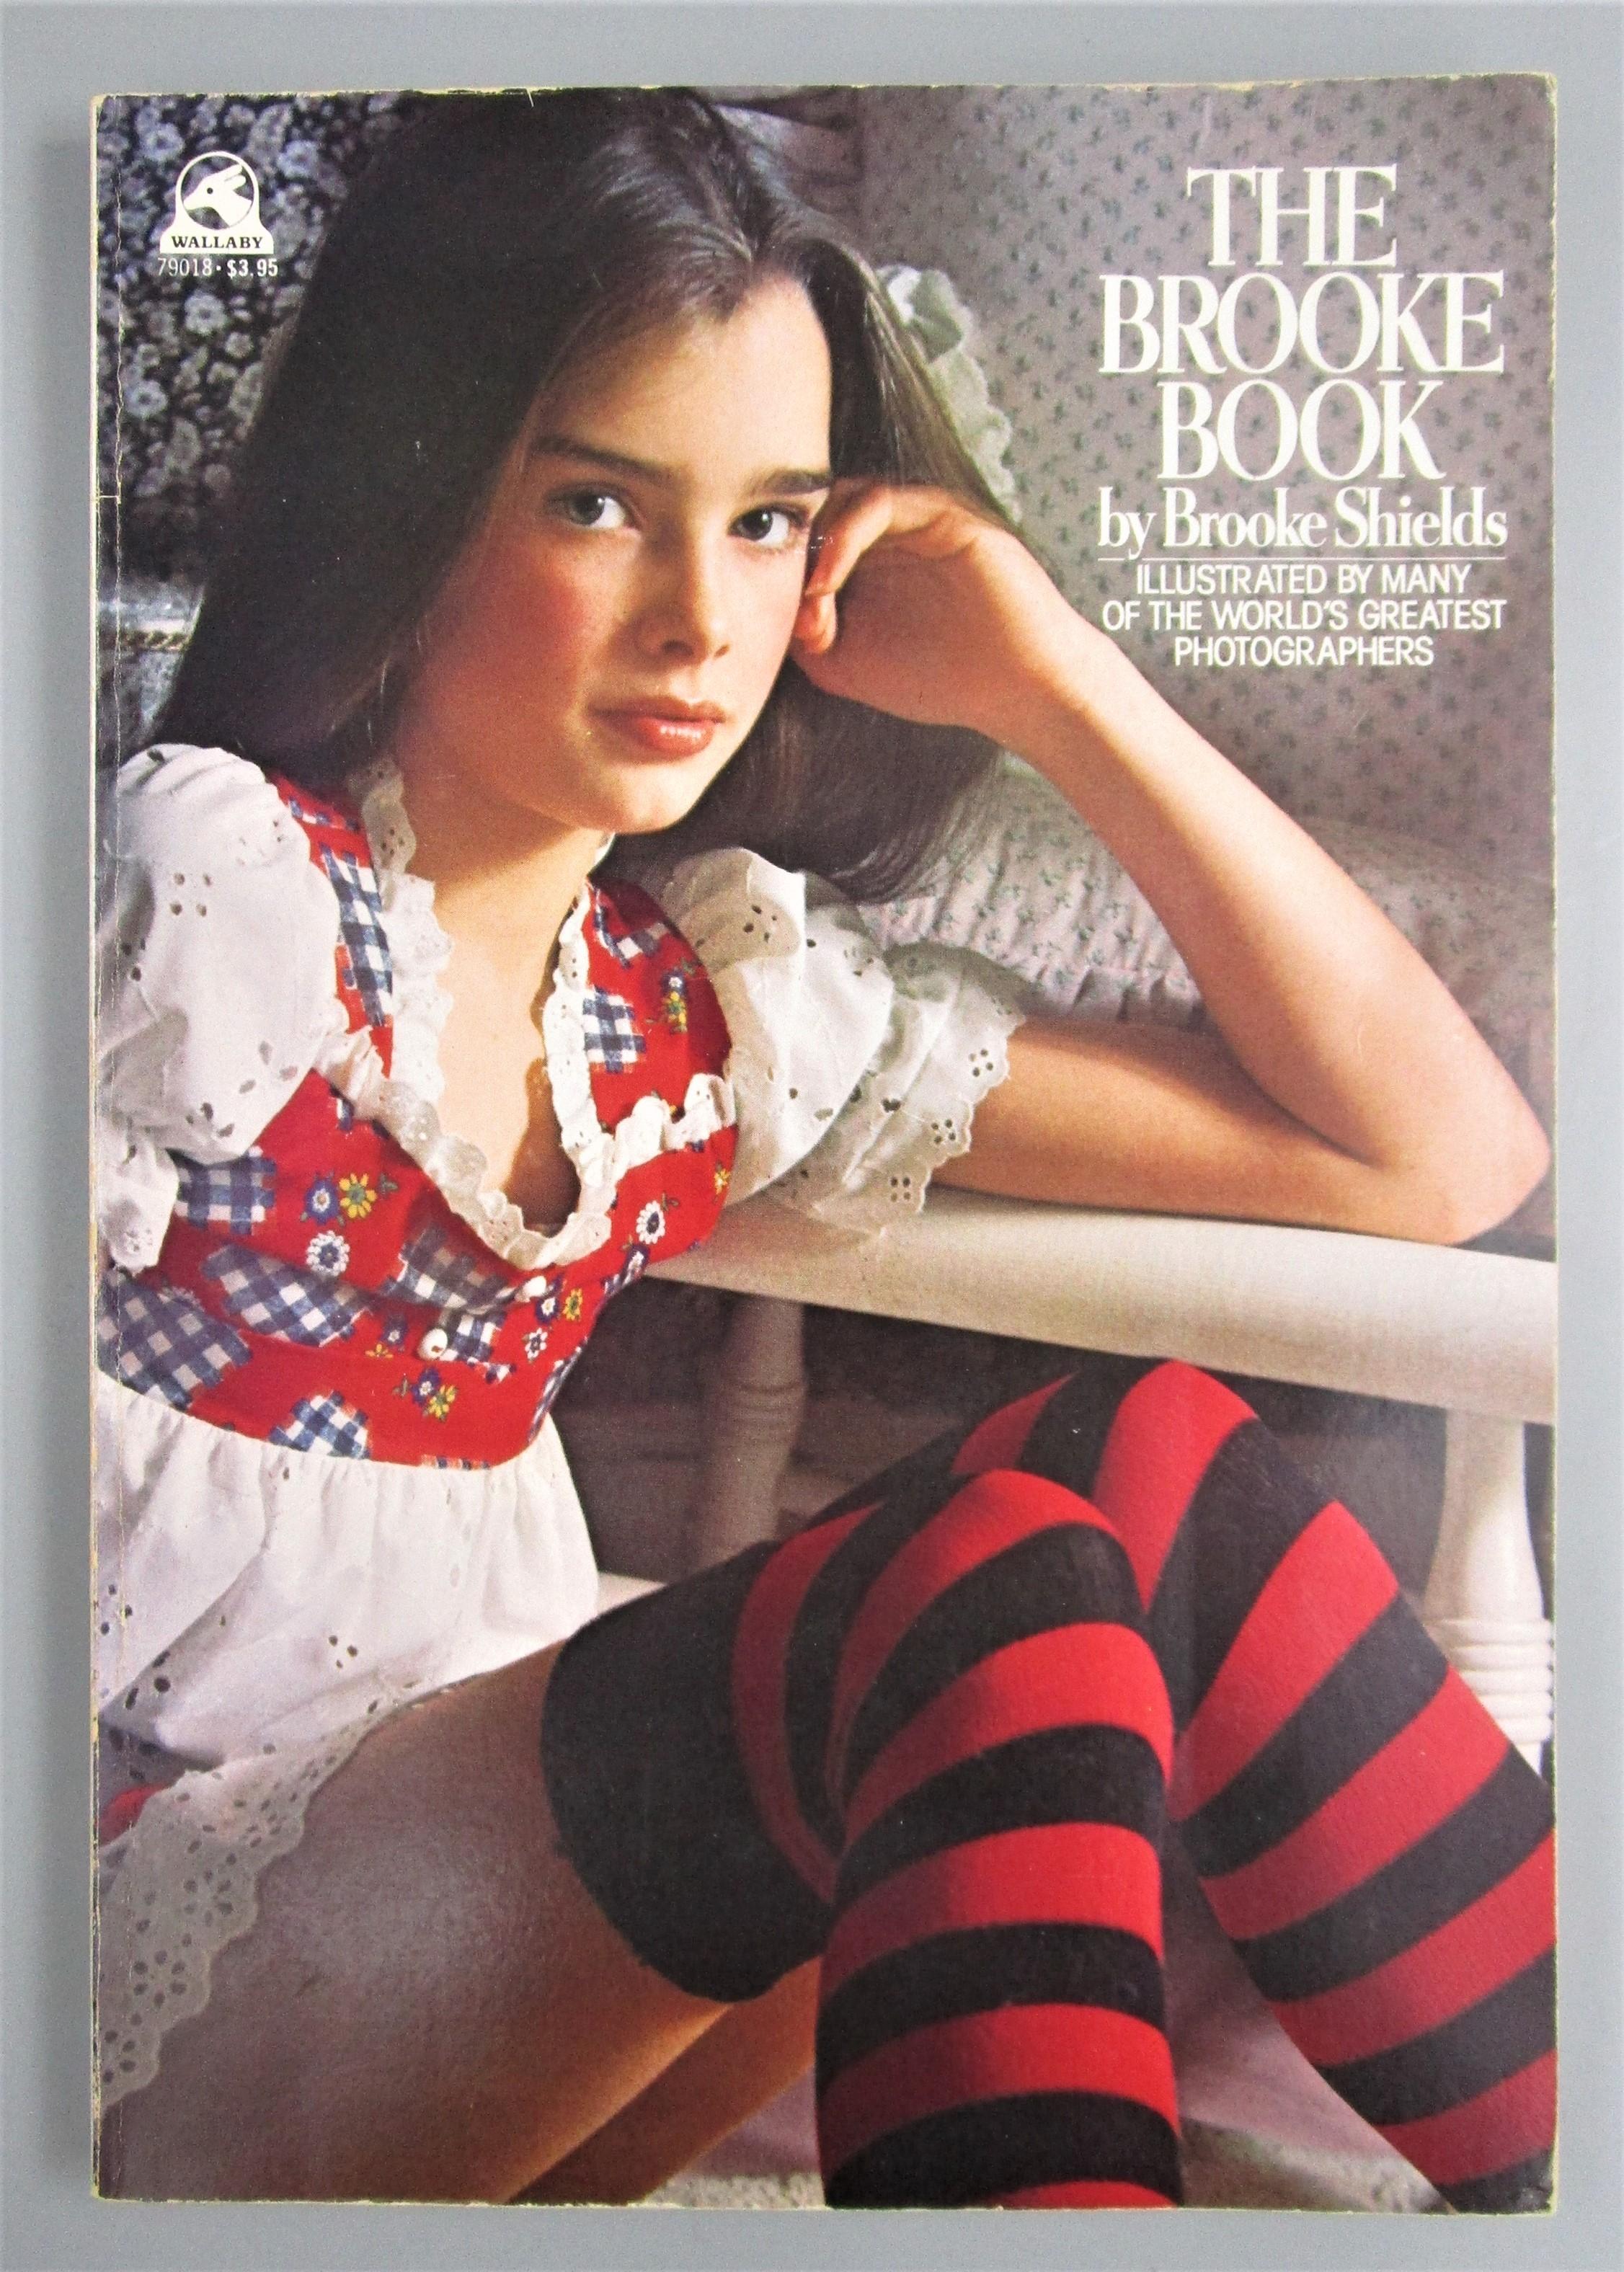 THE BROOKE BOOK, by Brooke Shields - 1978